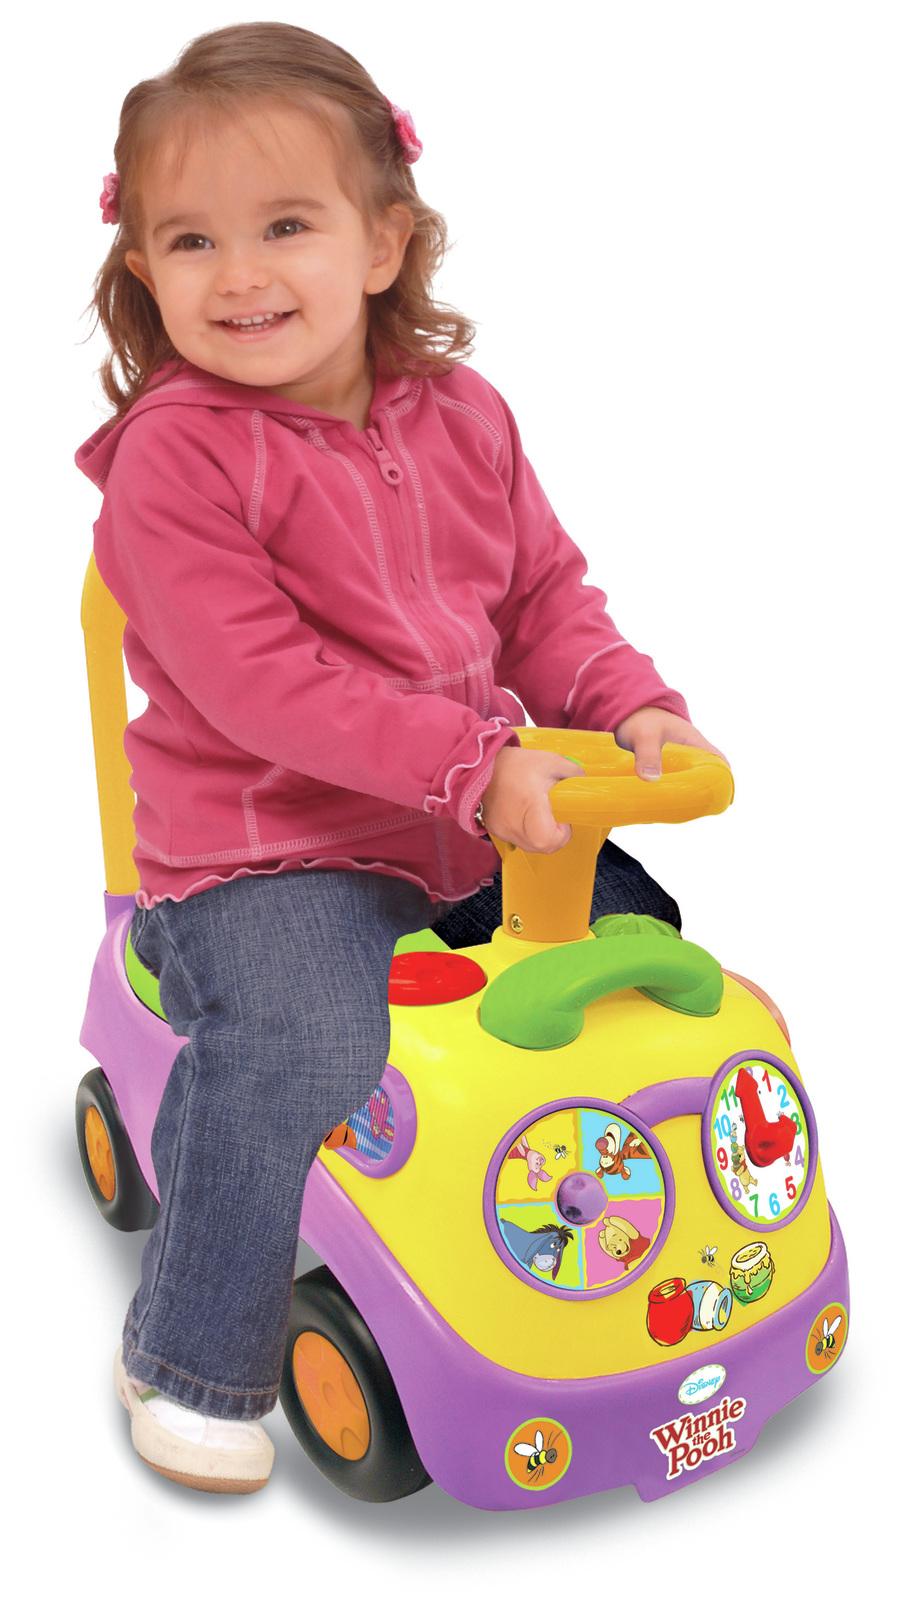 Kiddieland: My First Ride-On - Winnie the Pooh image